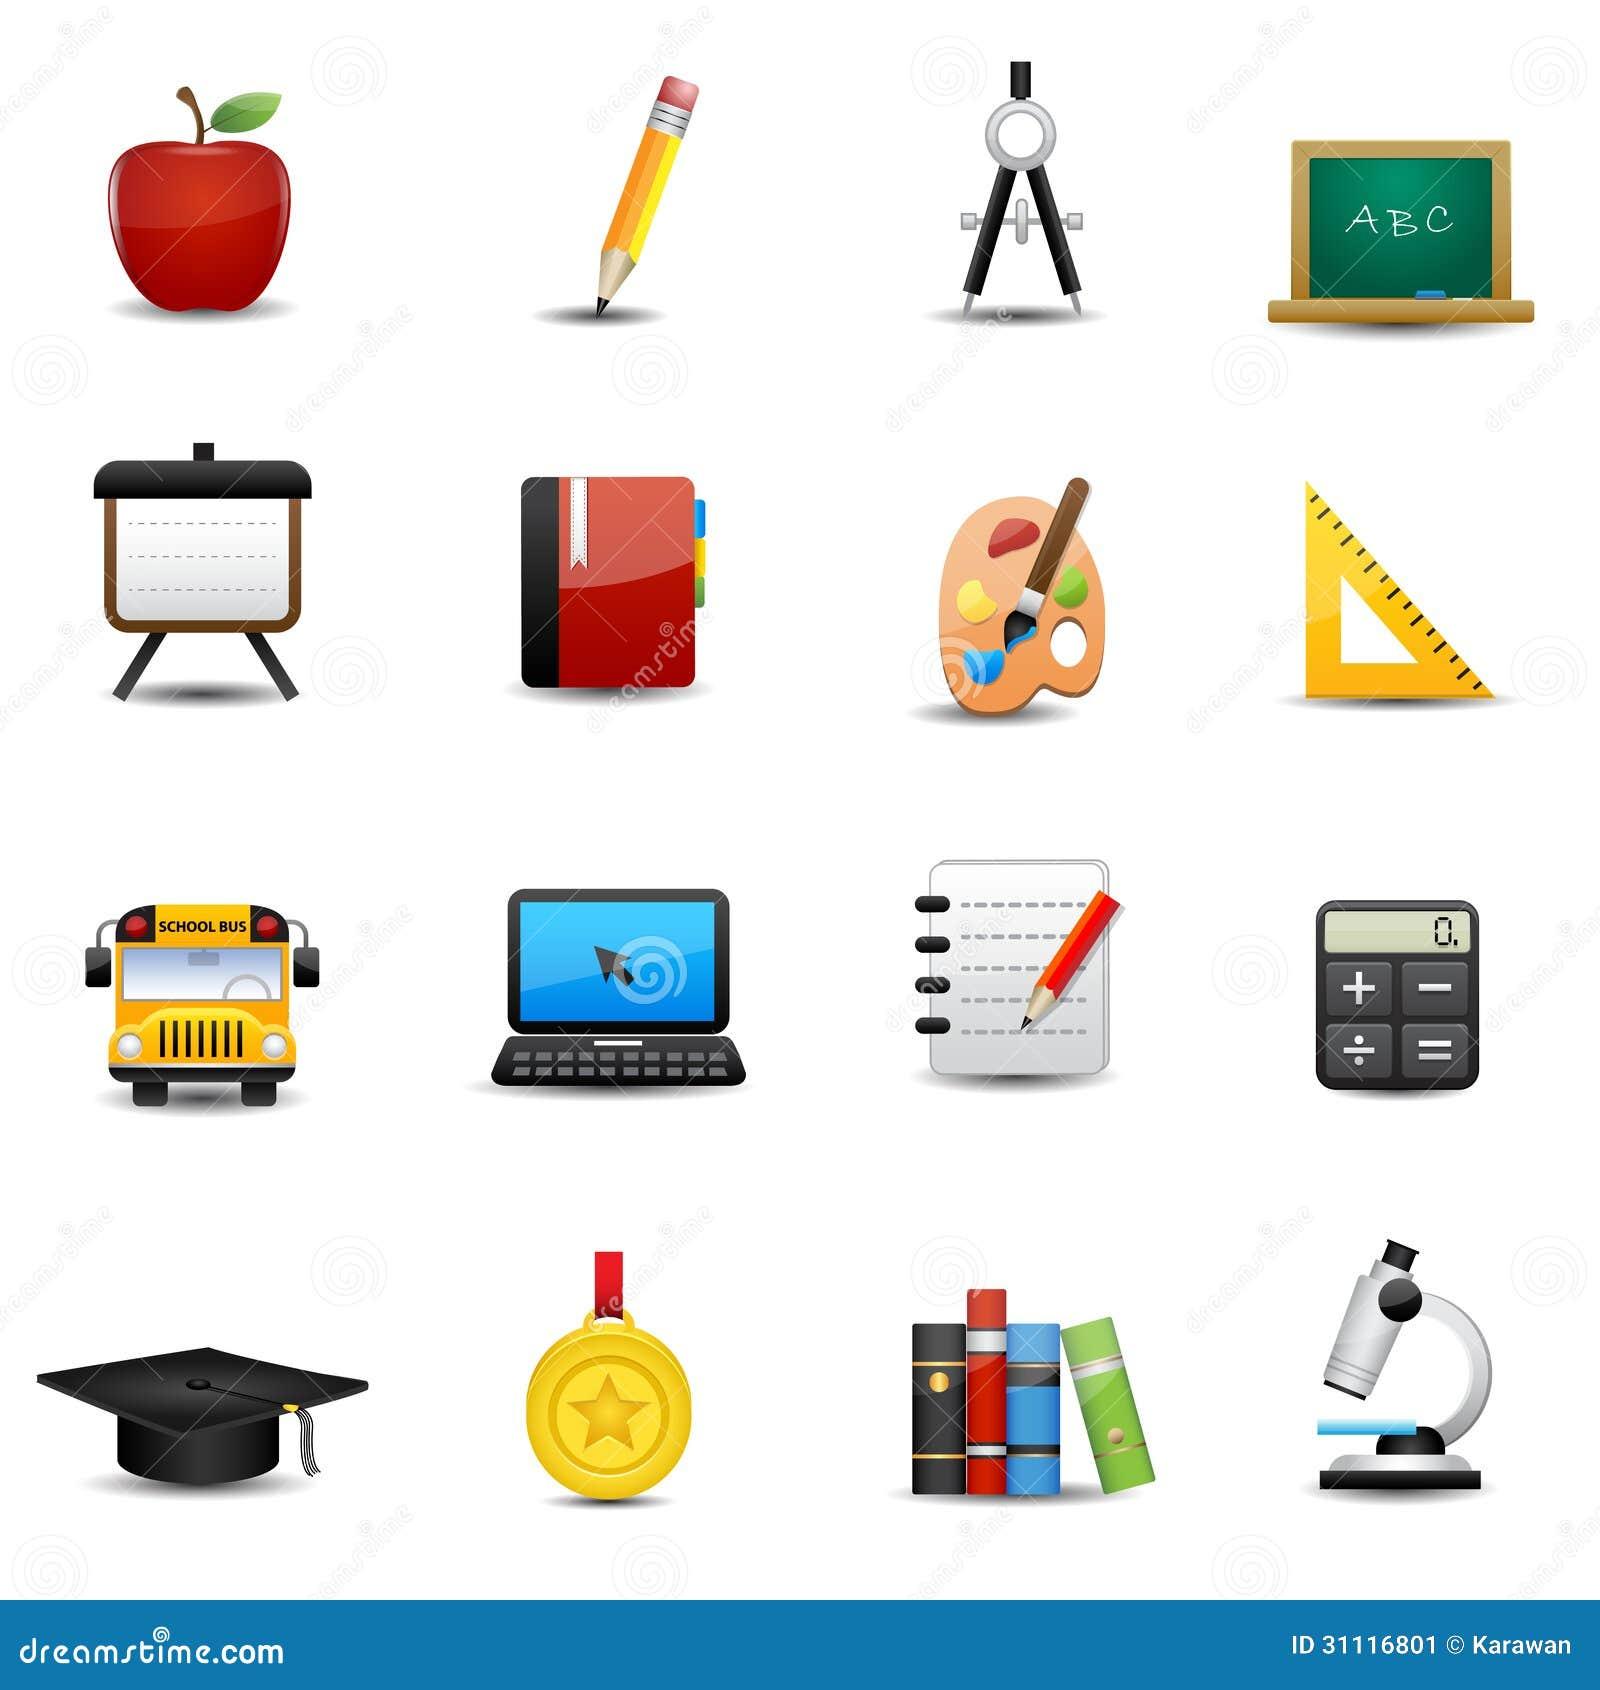 education icons set study university symbols 31116801 jpg 1300